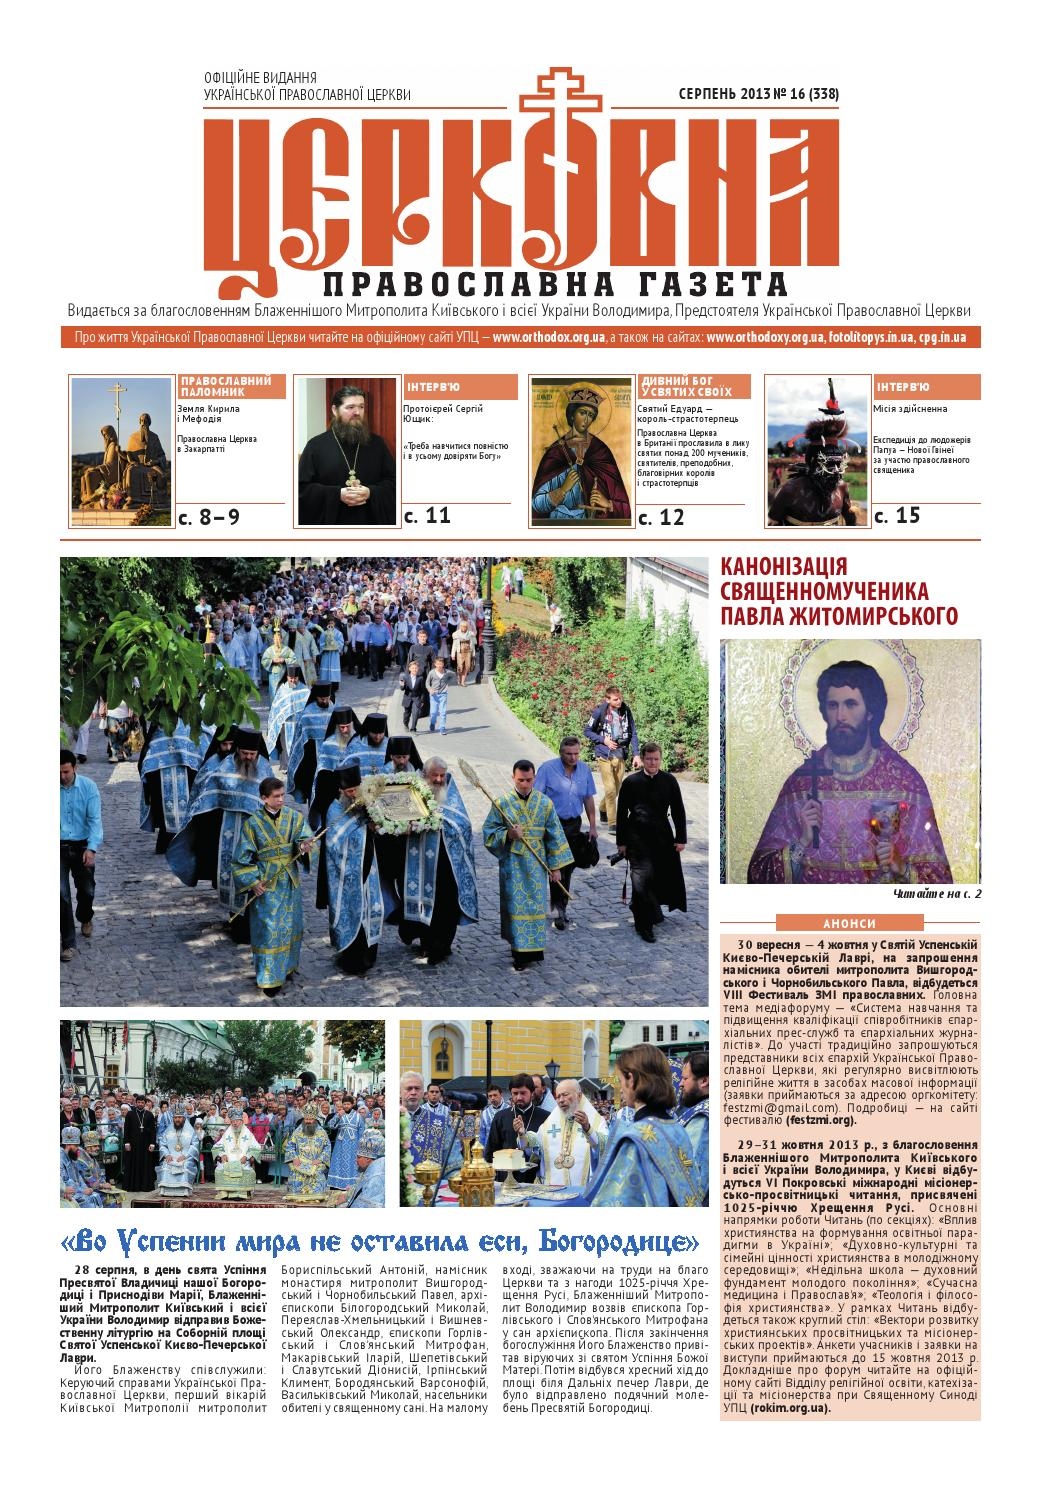 Cerkovna gazeta 2013 16 338 ua by blog CPG - issuu fb6fd952a80c4